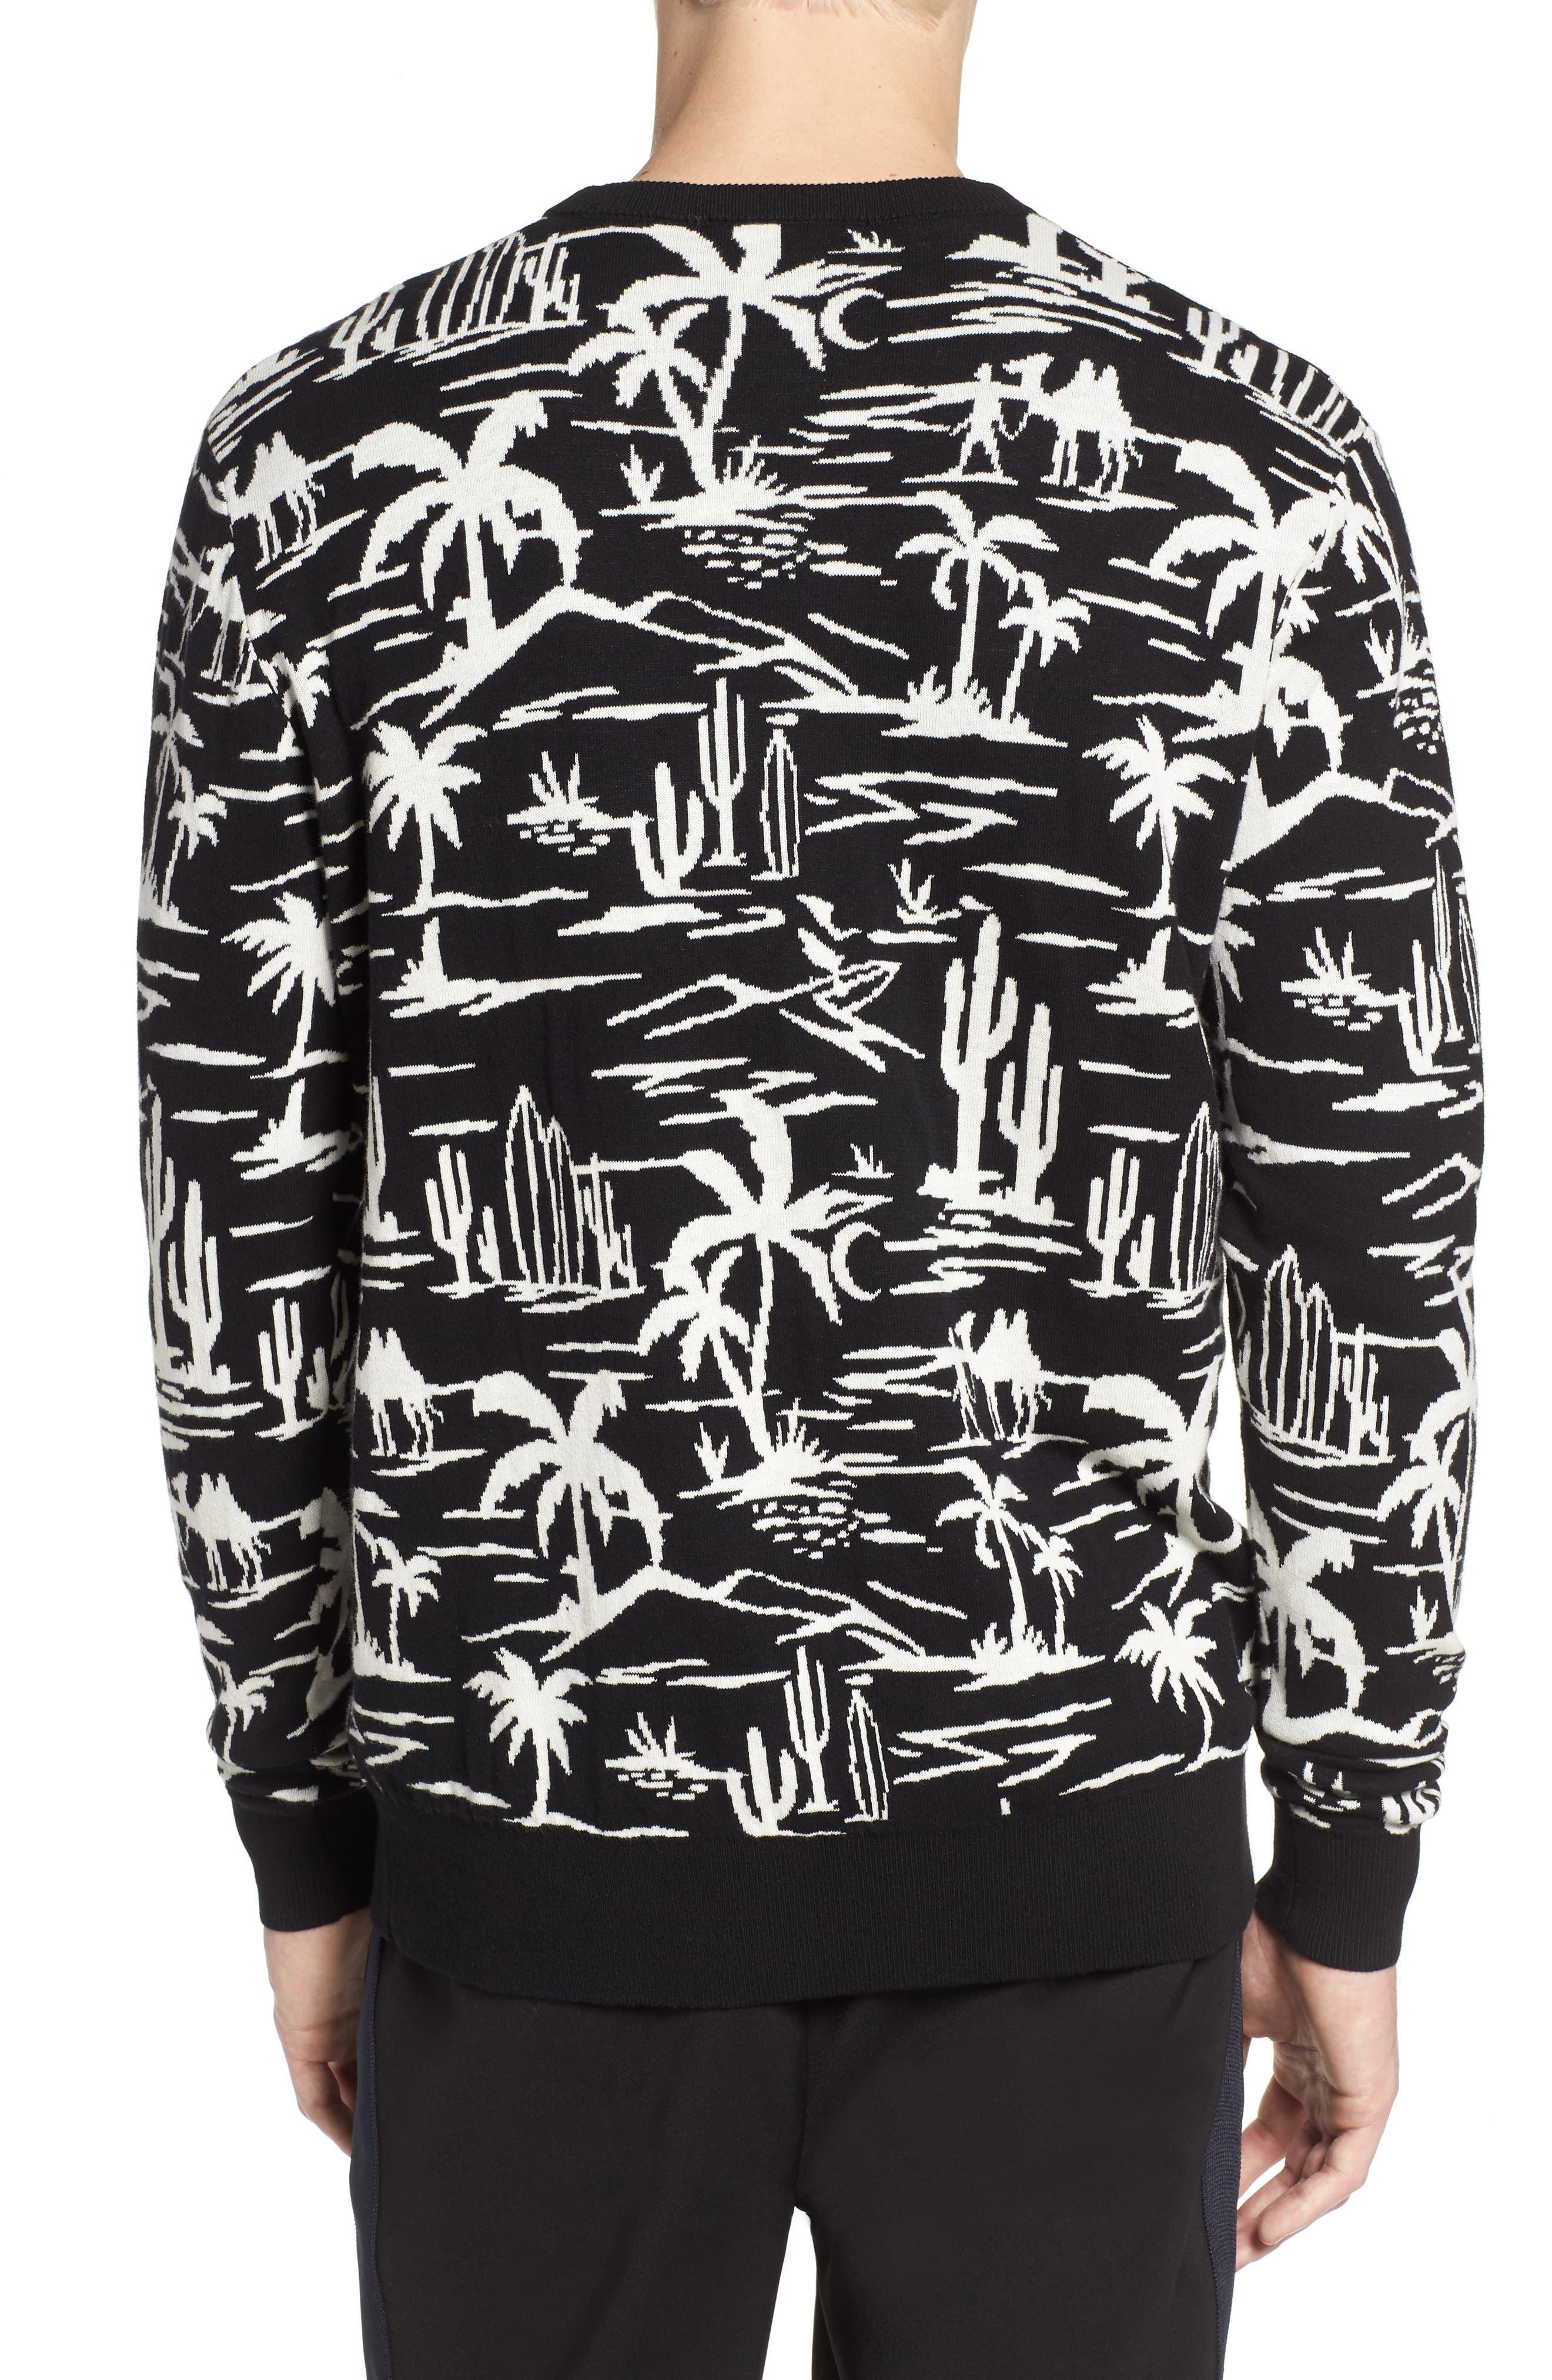 Jacquard Pattern Sweatshirt,                             Alternate thumbnail 2, color,                             002